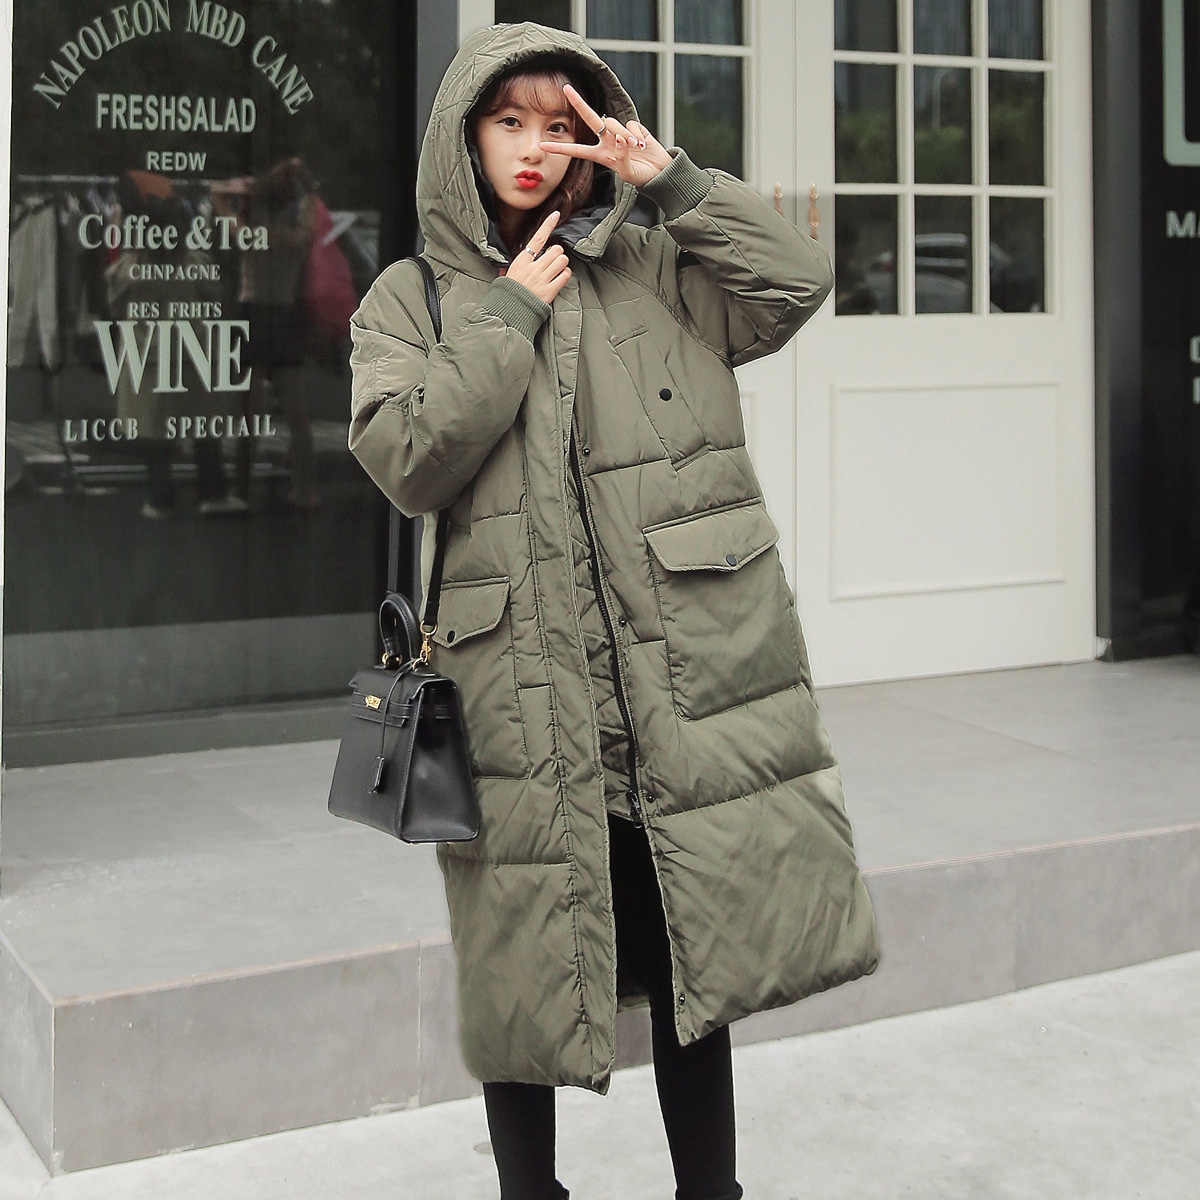 2017 Fashion Women Winter Warm Thicken Zipper Coat Cheap Chinese Quilted Jacket Hooded Palto Korean Solid Military Warm Cloak man woman winter warm cloak windcheater hooded cheap long large jacket thick maxi coat palto parka windbreaker korean overcoat